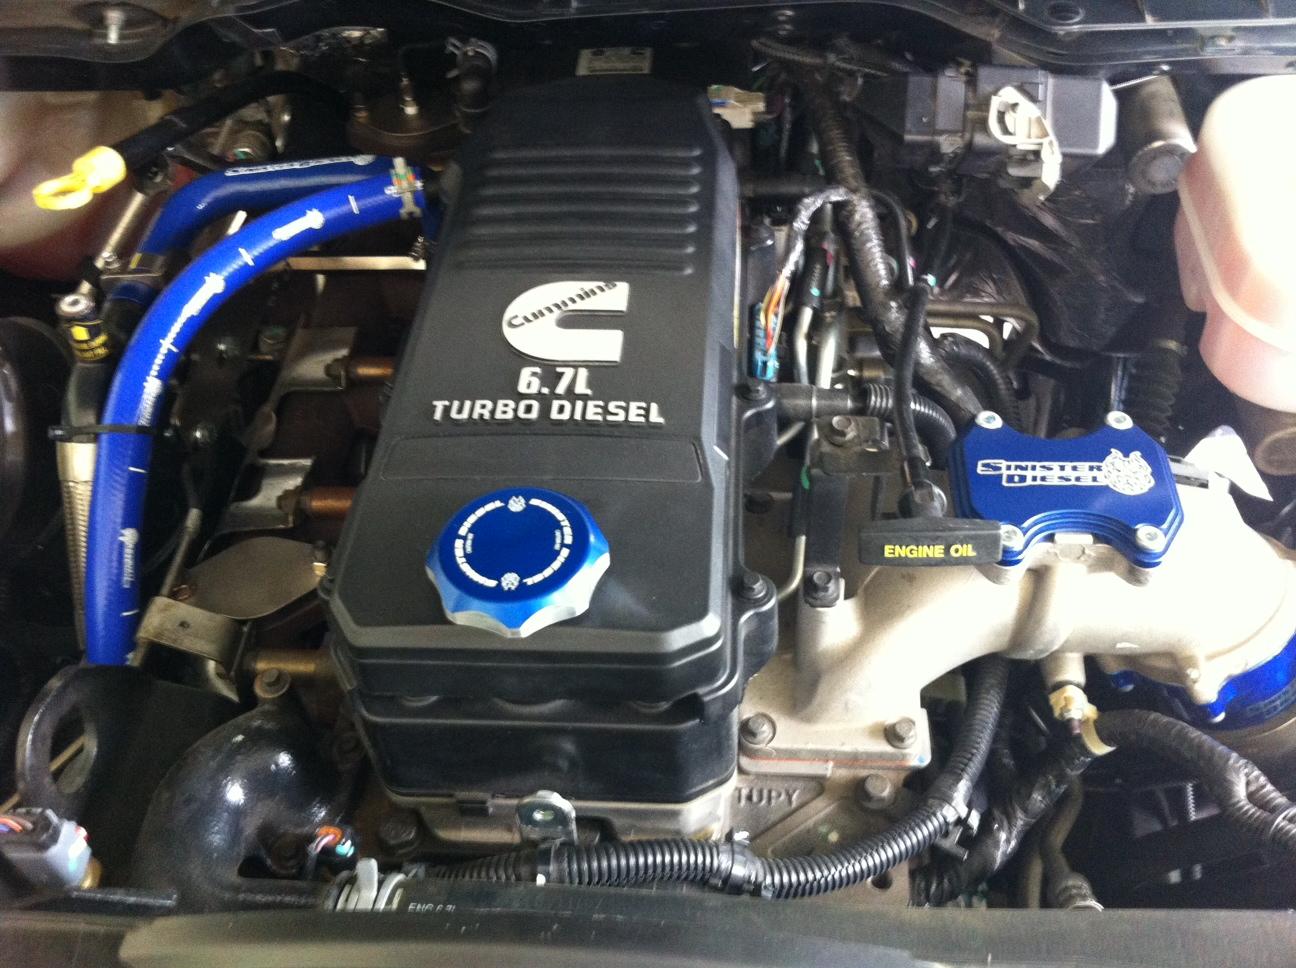 delete egr filter ccv ram 2500 performance cummins dodge diesel tube motor parts swap forum 4x4 help level slt 7l